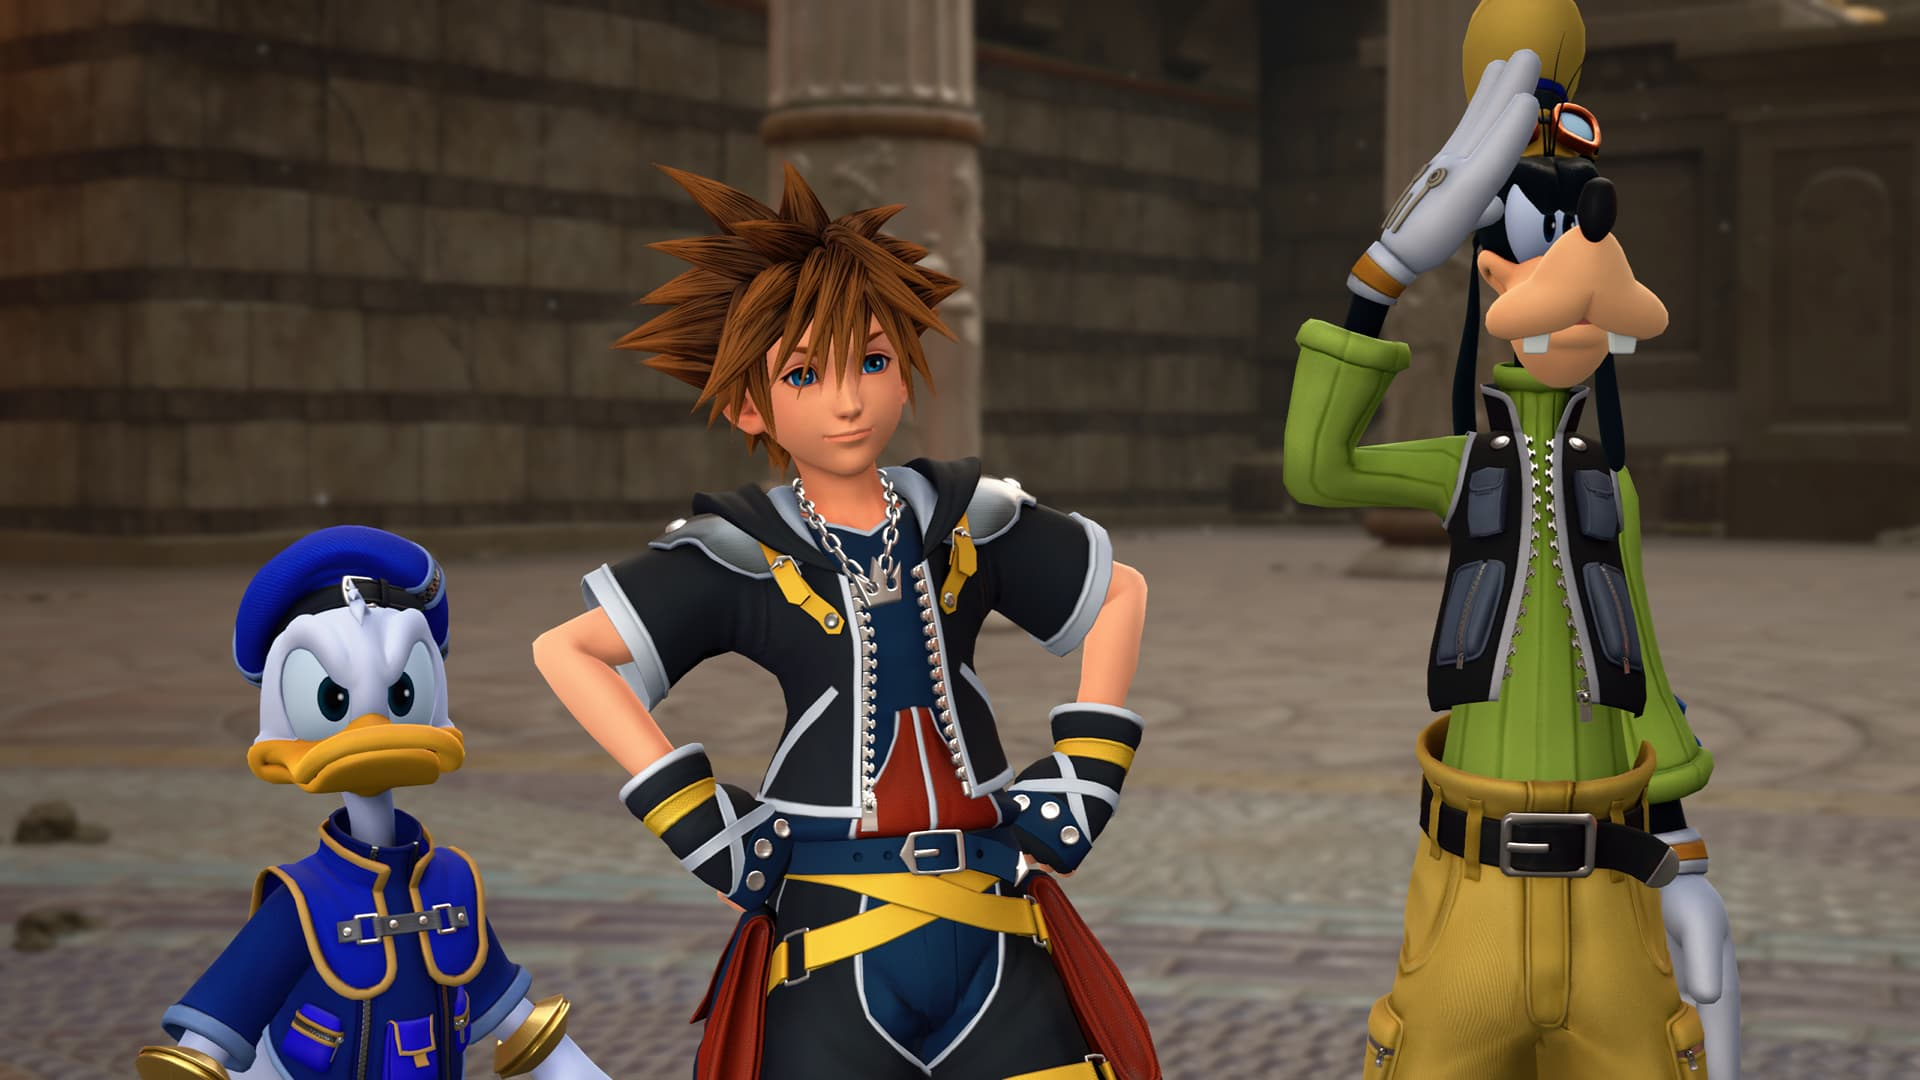 Análisis de Kingdom Hearts III - Xbox One 1